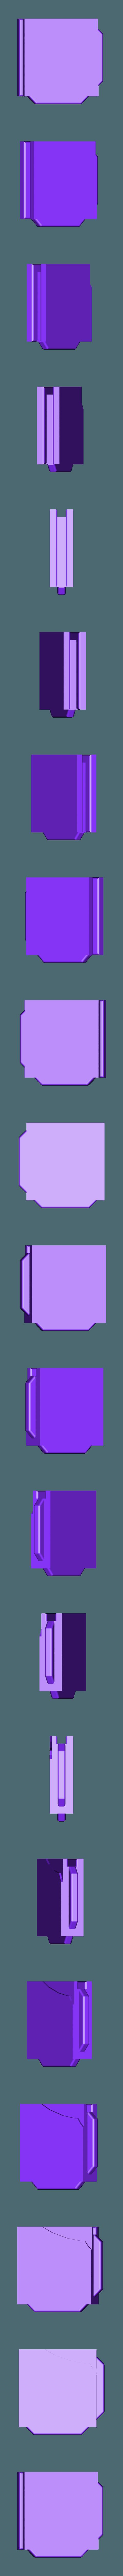 Piece - Part 10.stl Download free STL file Taquin CULTS / Sliding Puzzle • 3D print model, Valelab3D